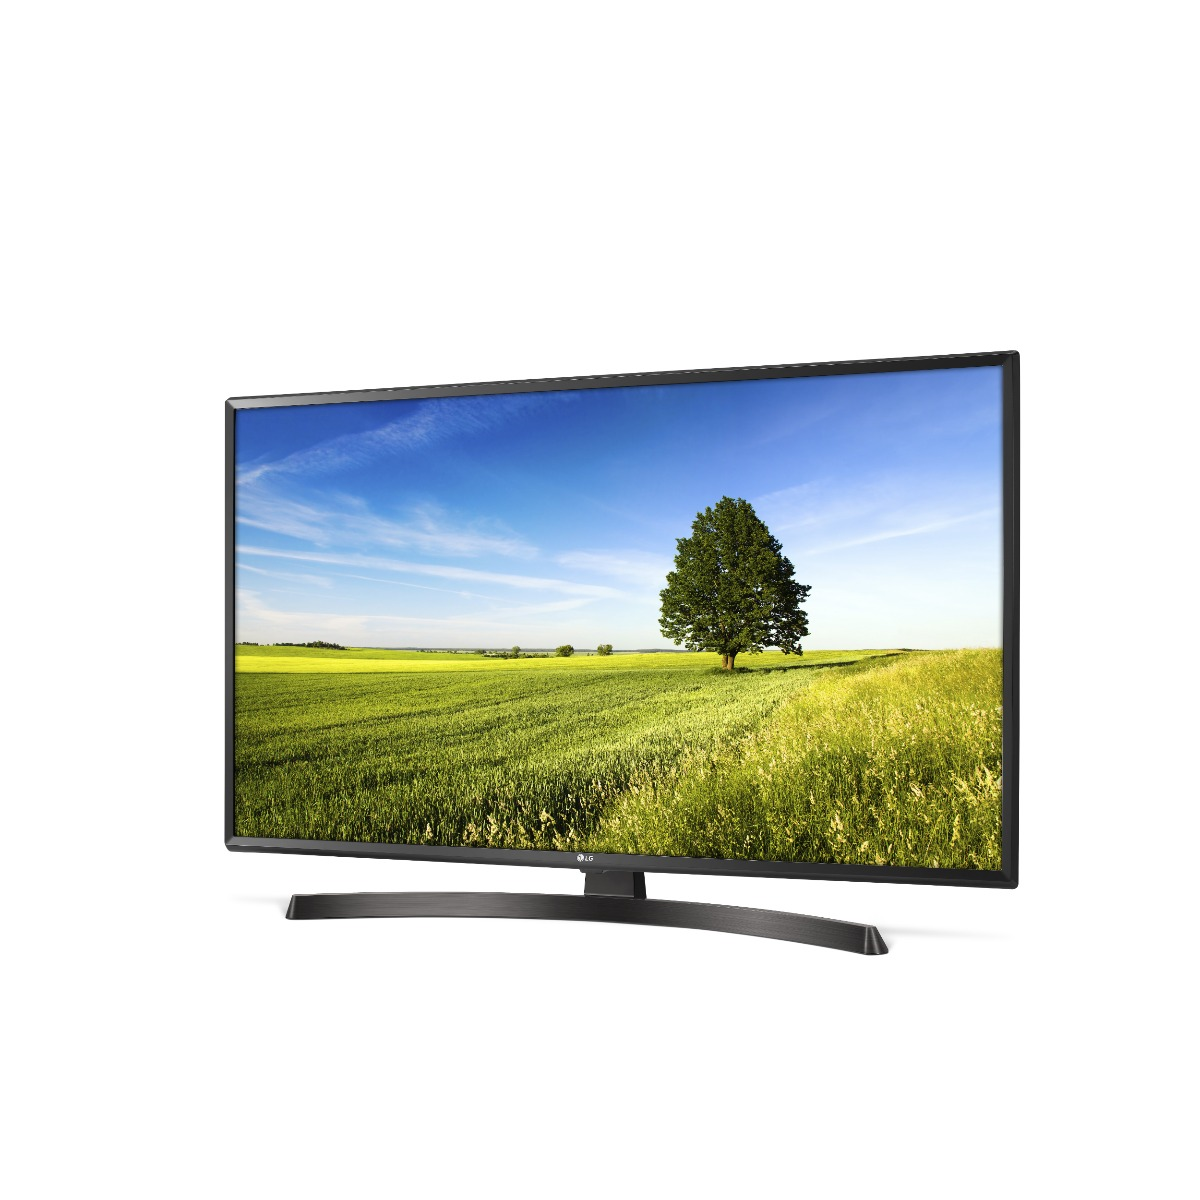 LG 43 inch/109 cm LED TV